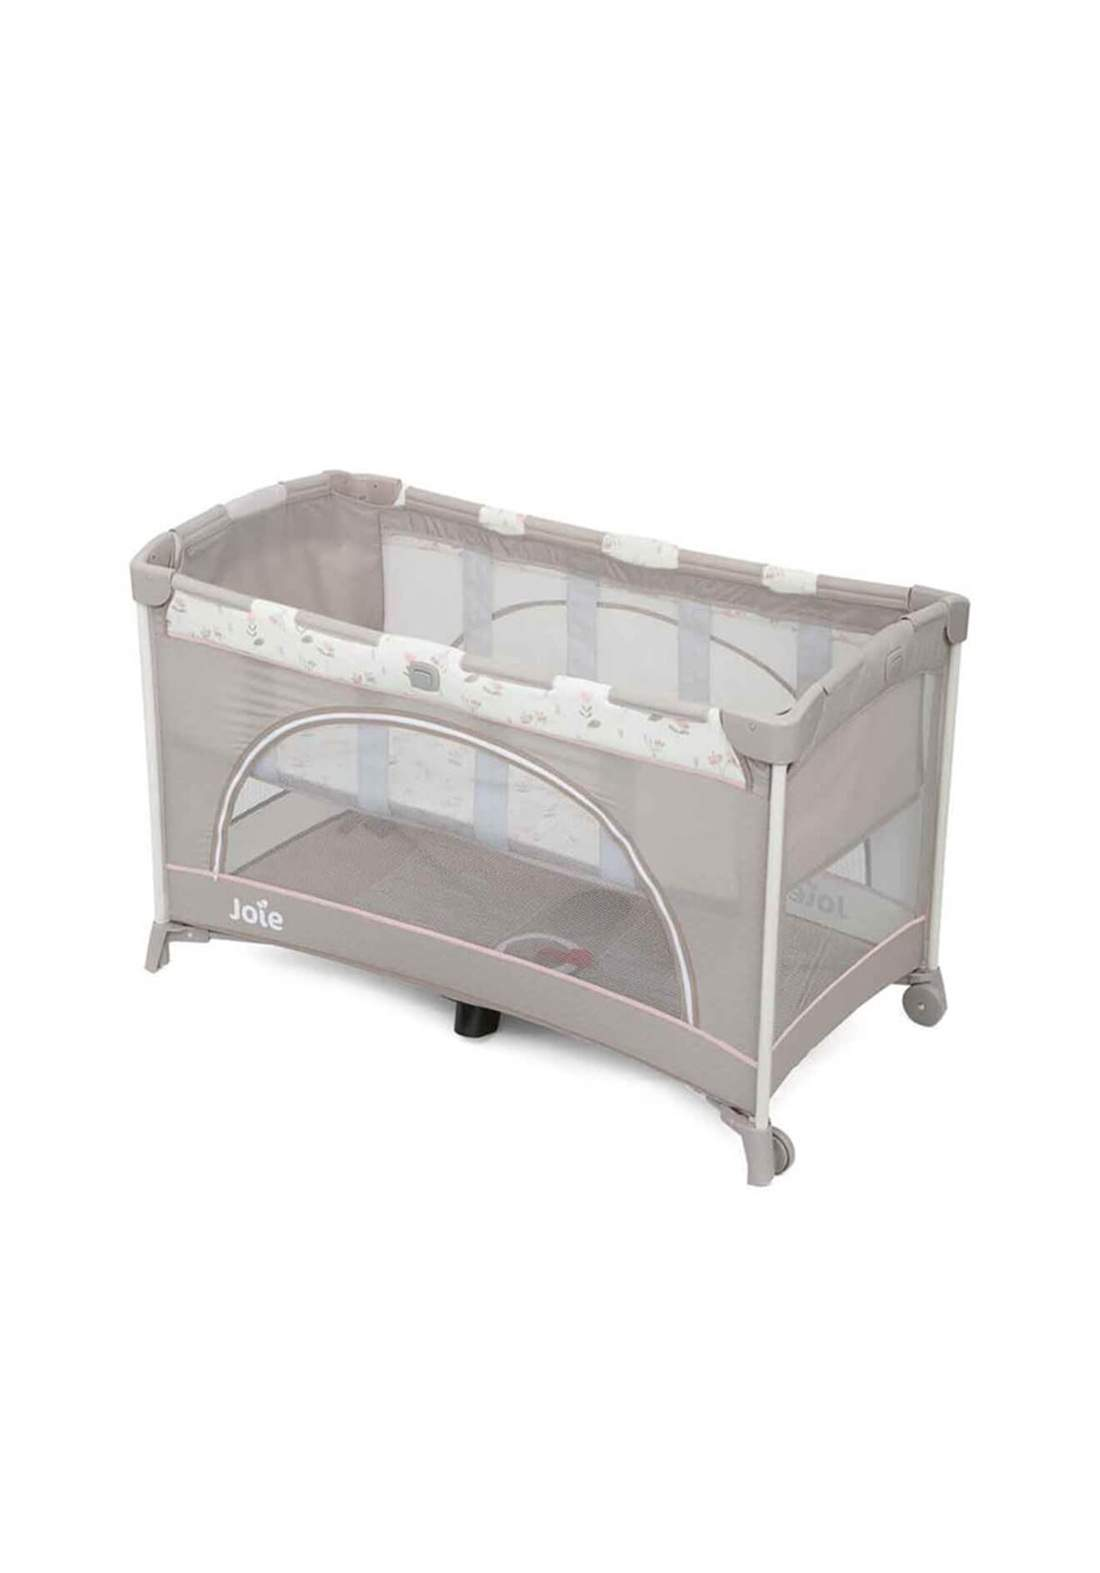 سرير نوم للاطفال Joie Baby P1206BAFLF000 CUNA VIAJE JOIE ALLURA GRIS FLOWERS FORE